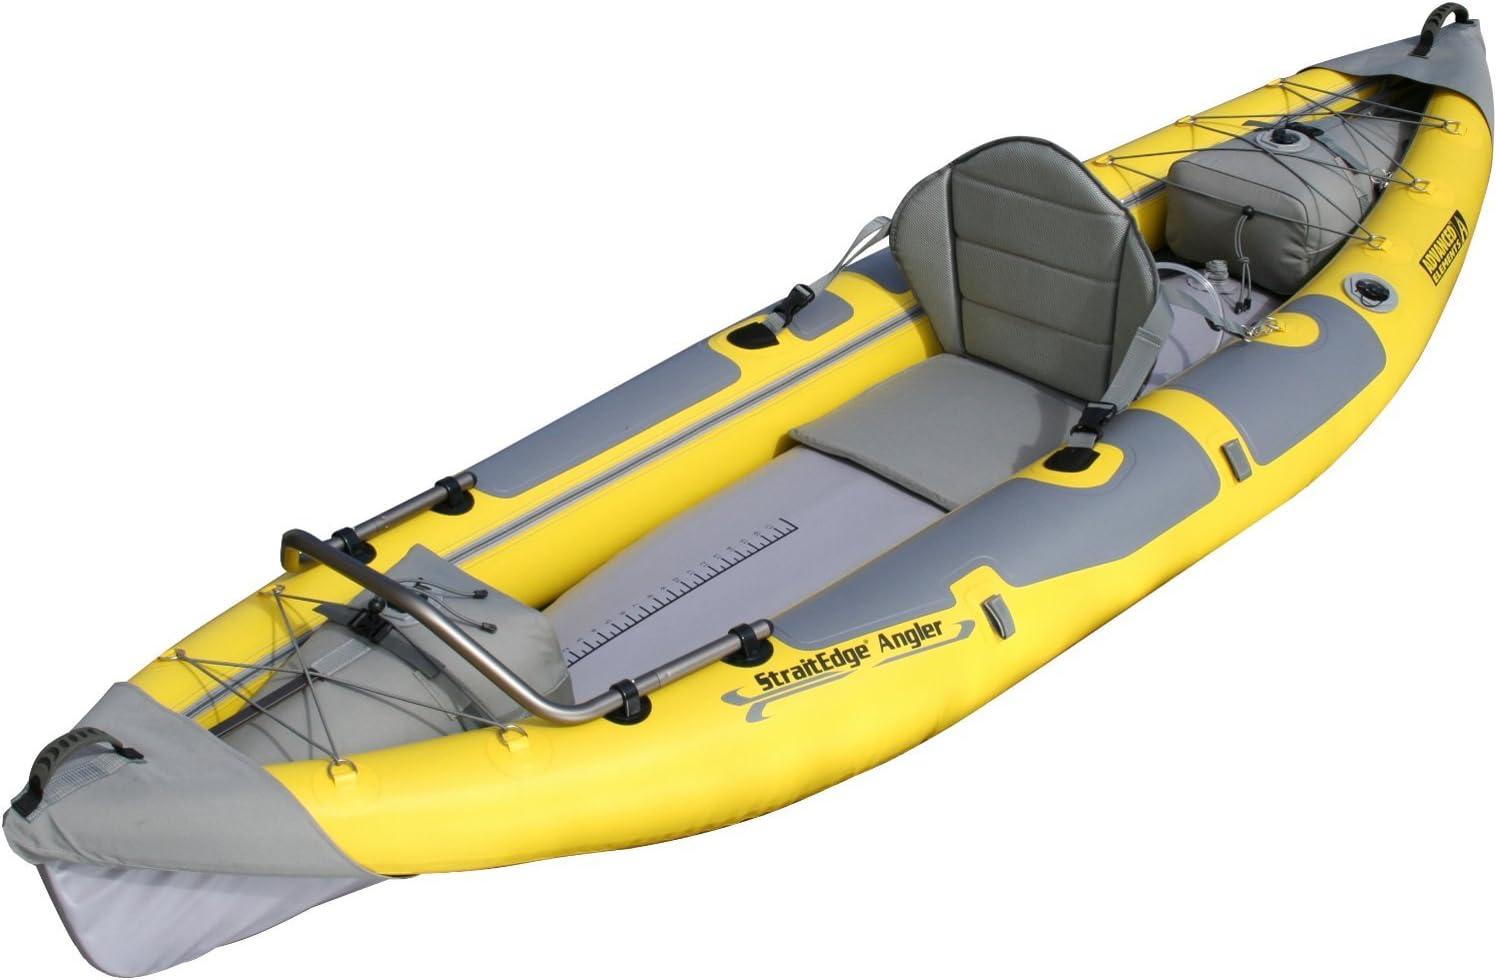 best budget angler kayak - ADVANCED ELEMENTS